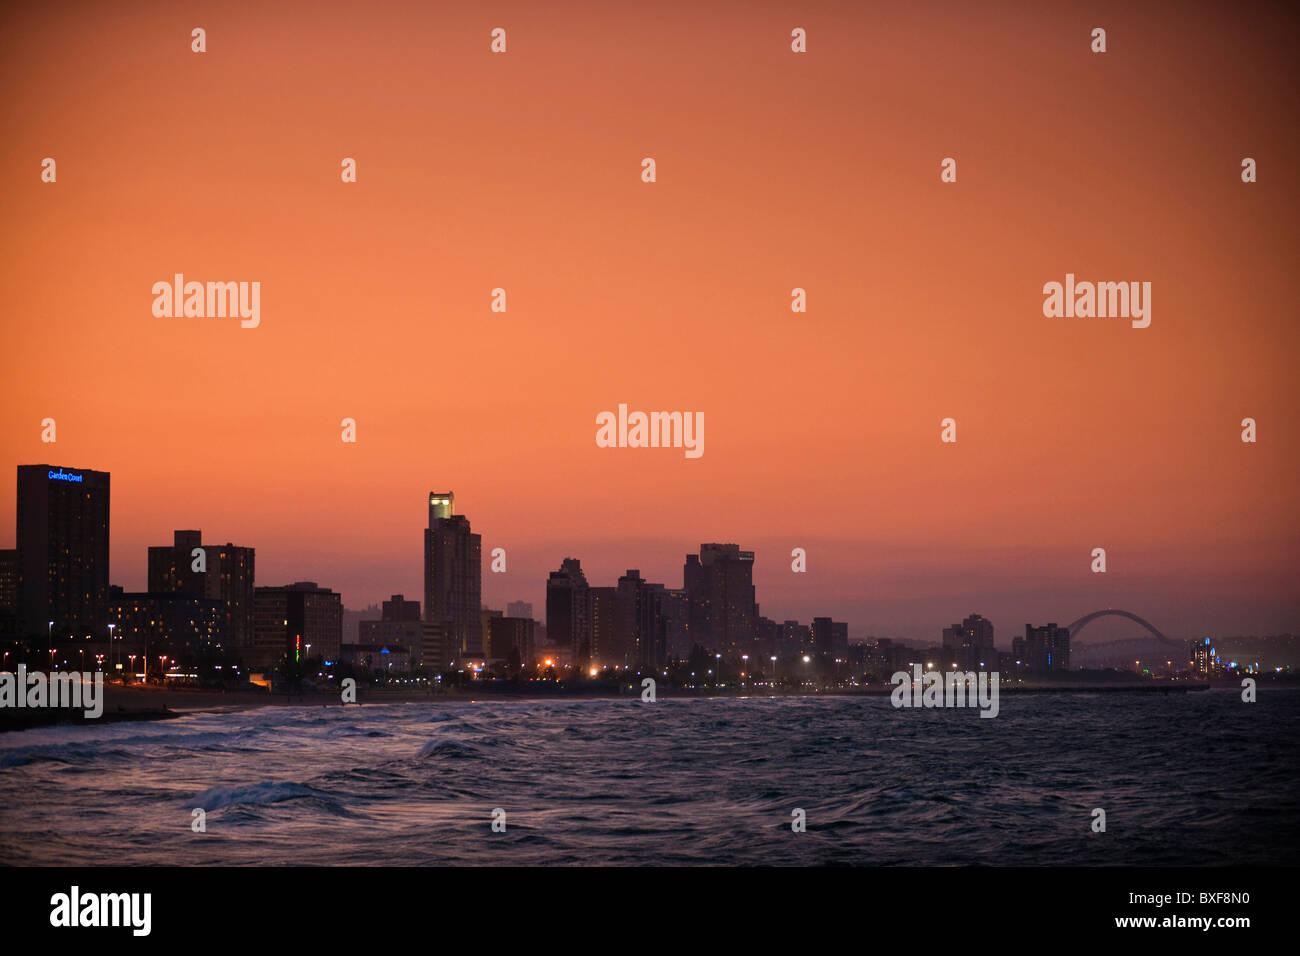 View of Durban skyline from the Point Development. Durban. KwaZulu Natal, Suedafrika. - Stock Image